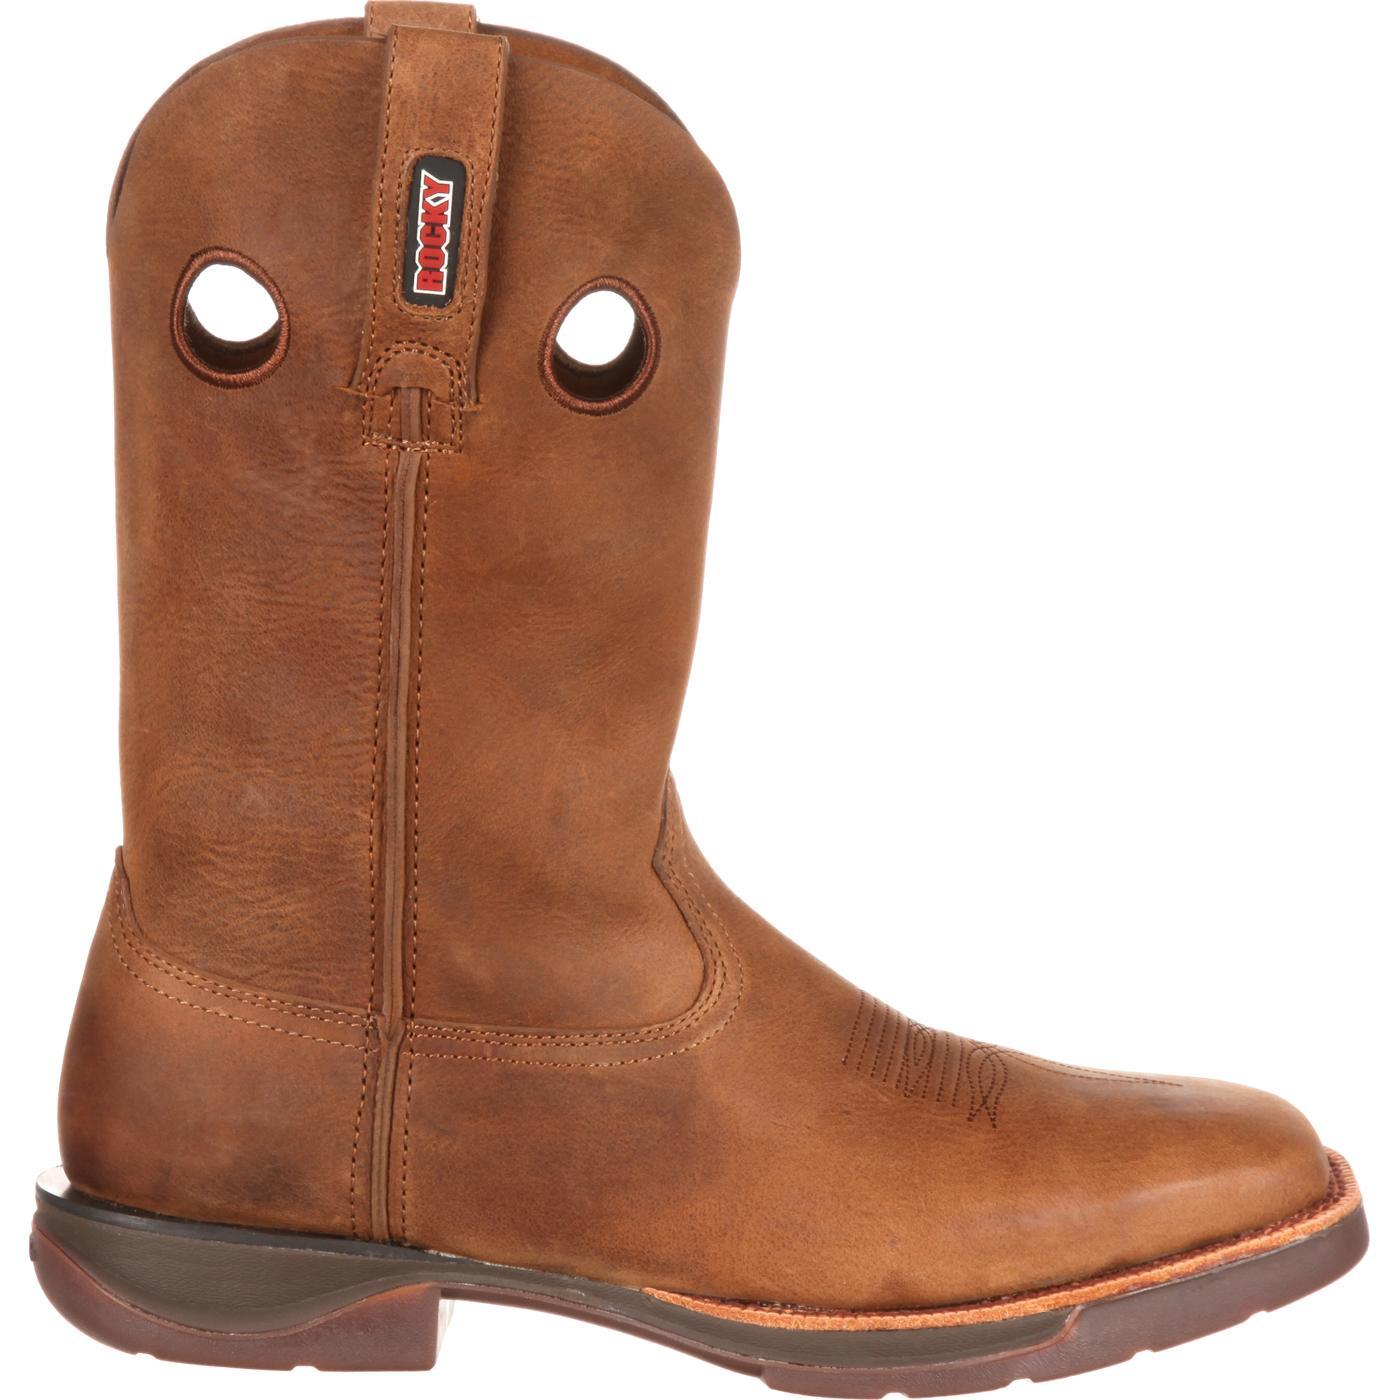 Rocky LT: Men's Light Roper Western Boot - style #RKW0142